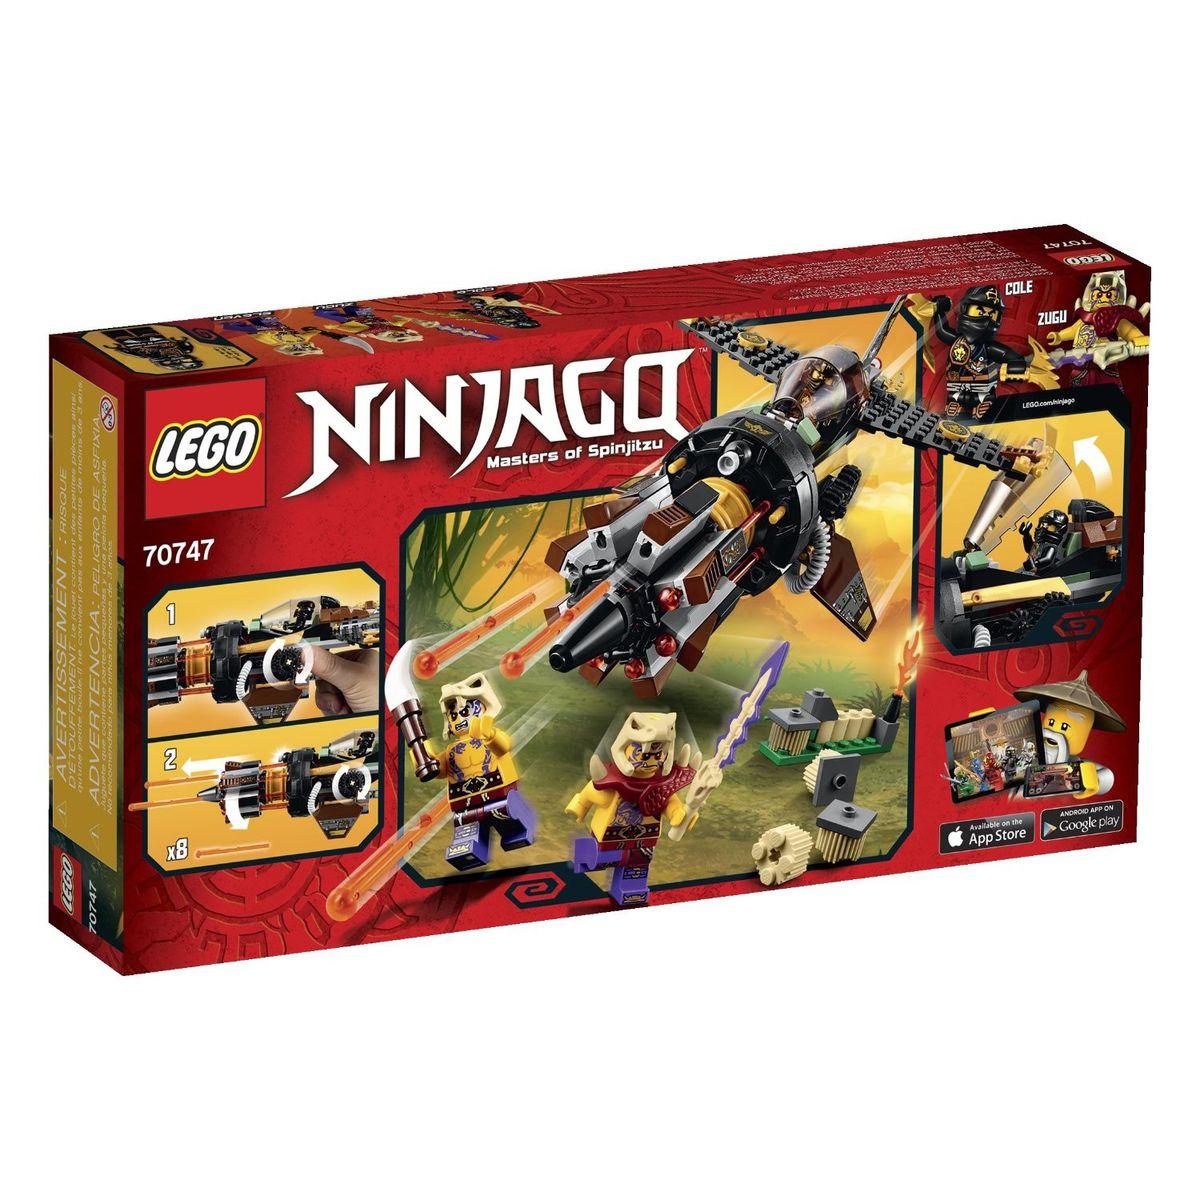 Lego Ninjago Toys : Lego ninjago boulder blaster toy buy online in south